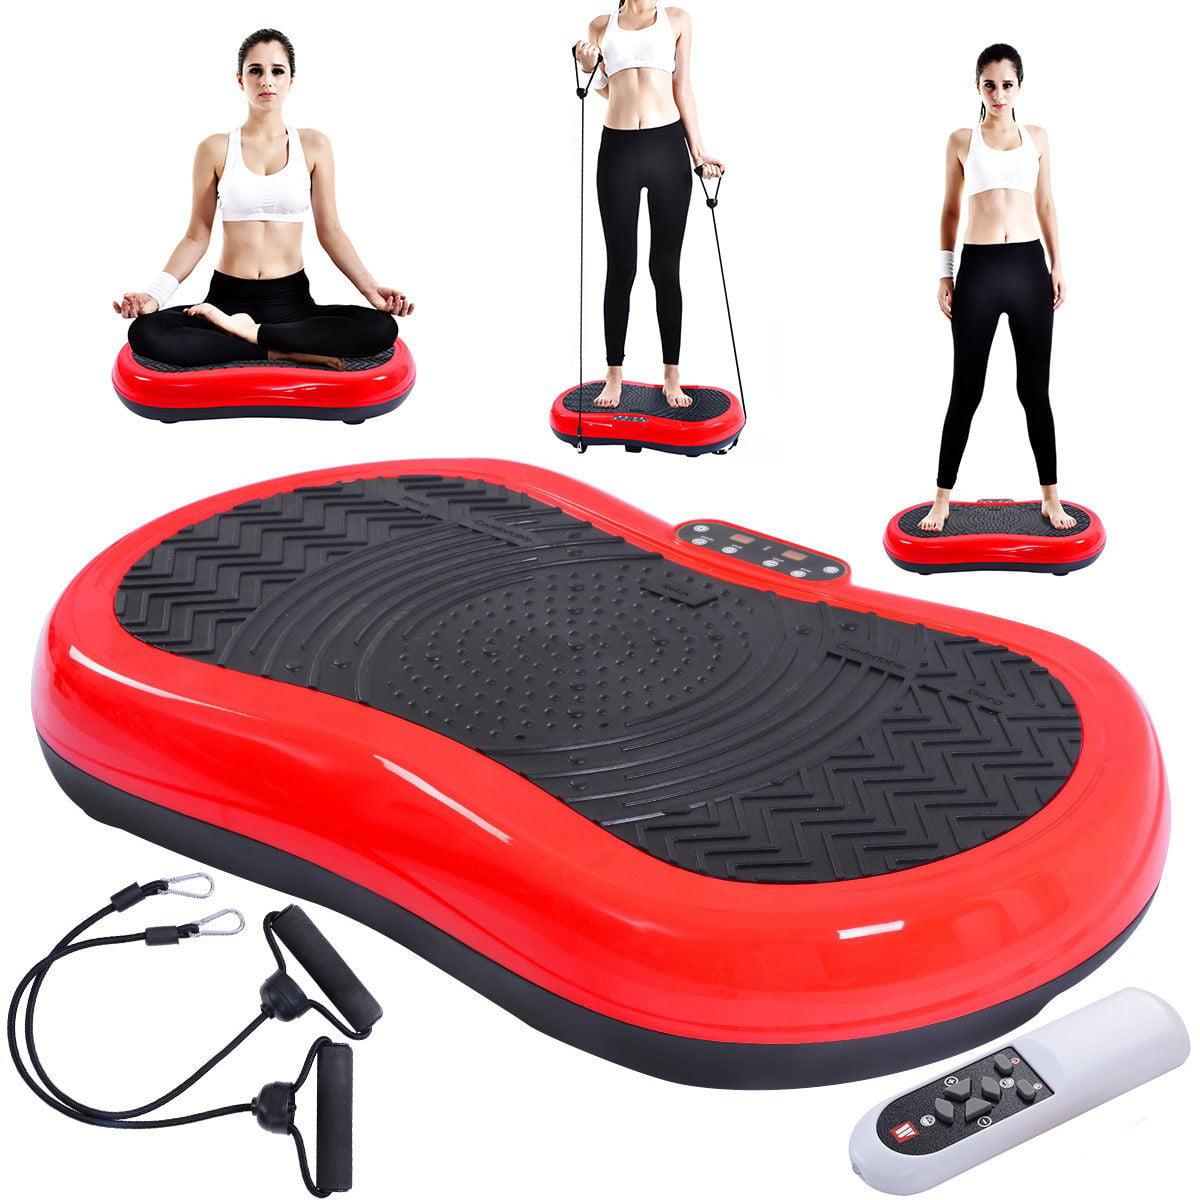 Vibration Machine Exercise Platform w/ Straps + Remote Co...